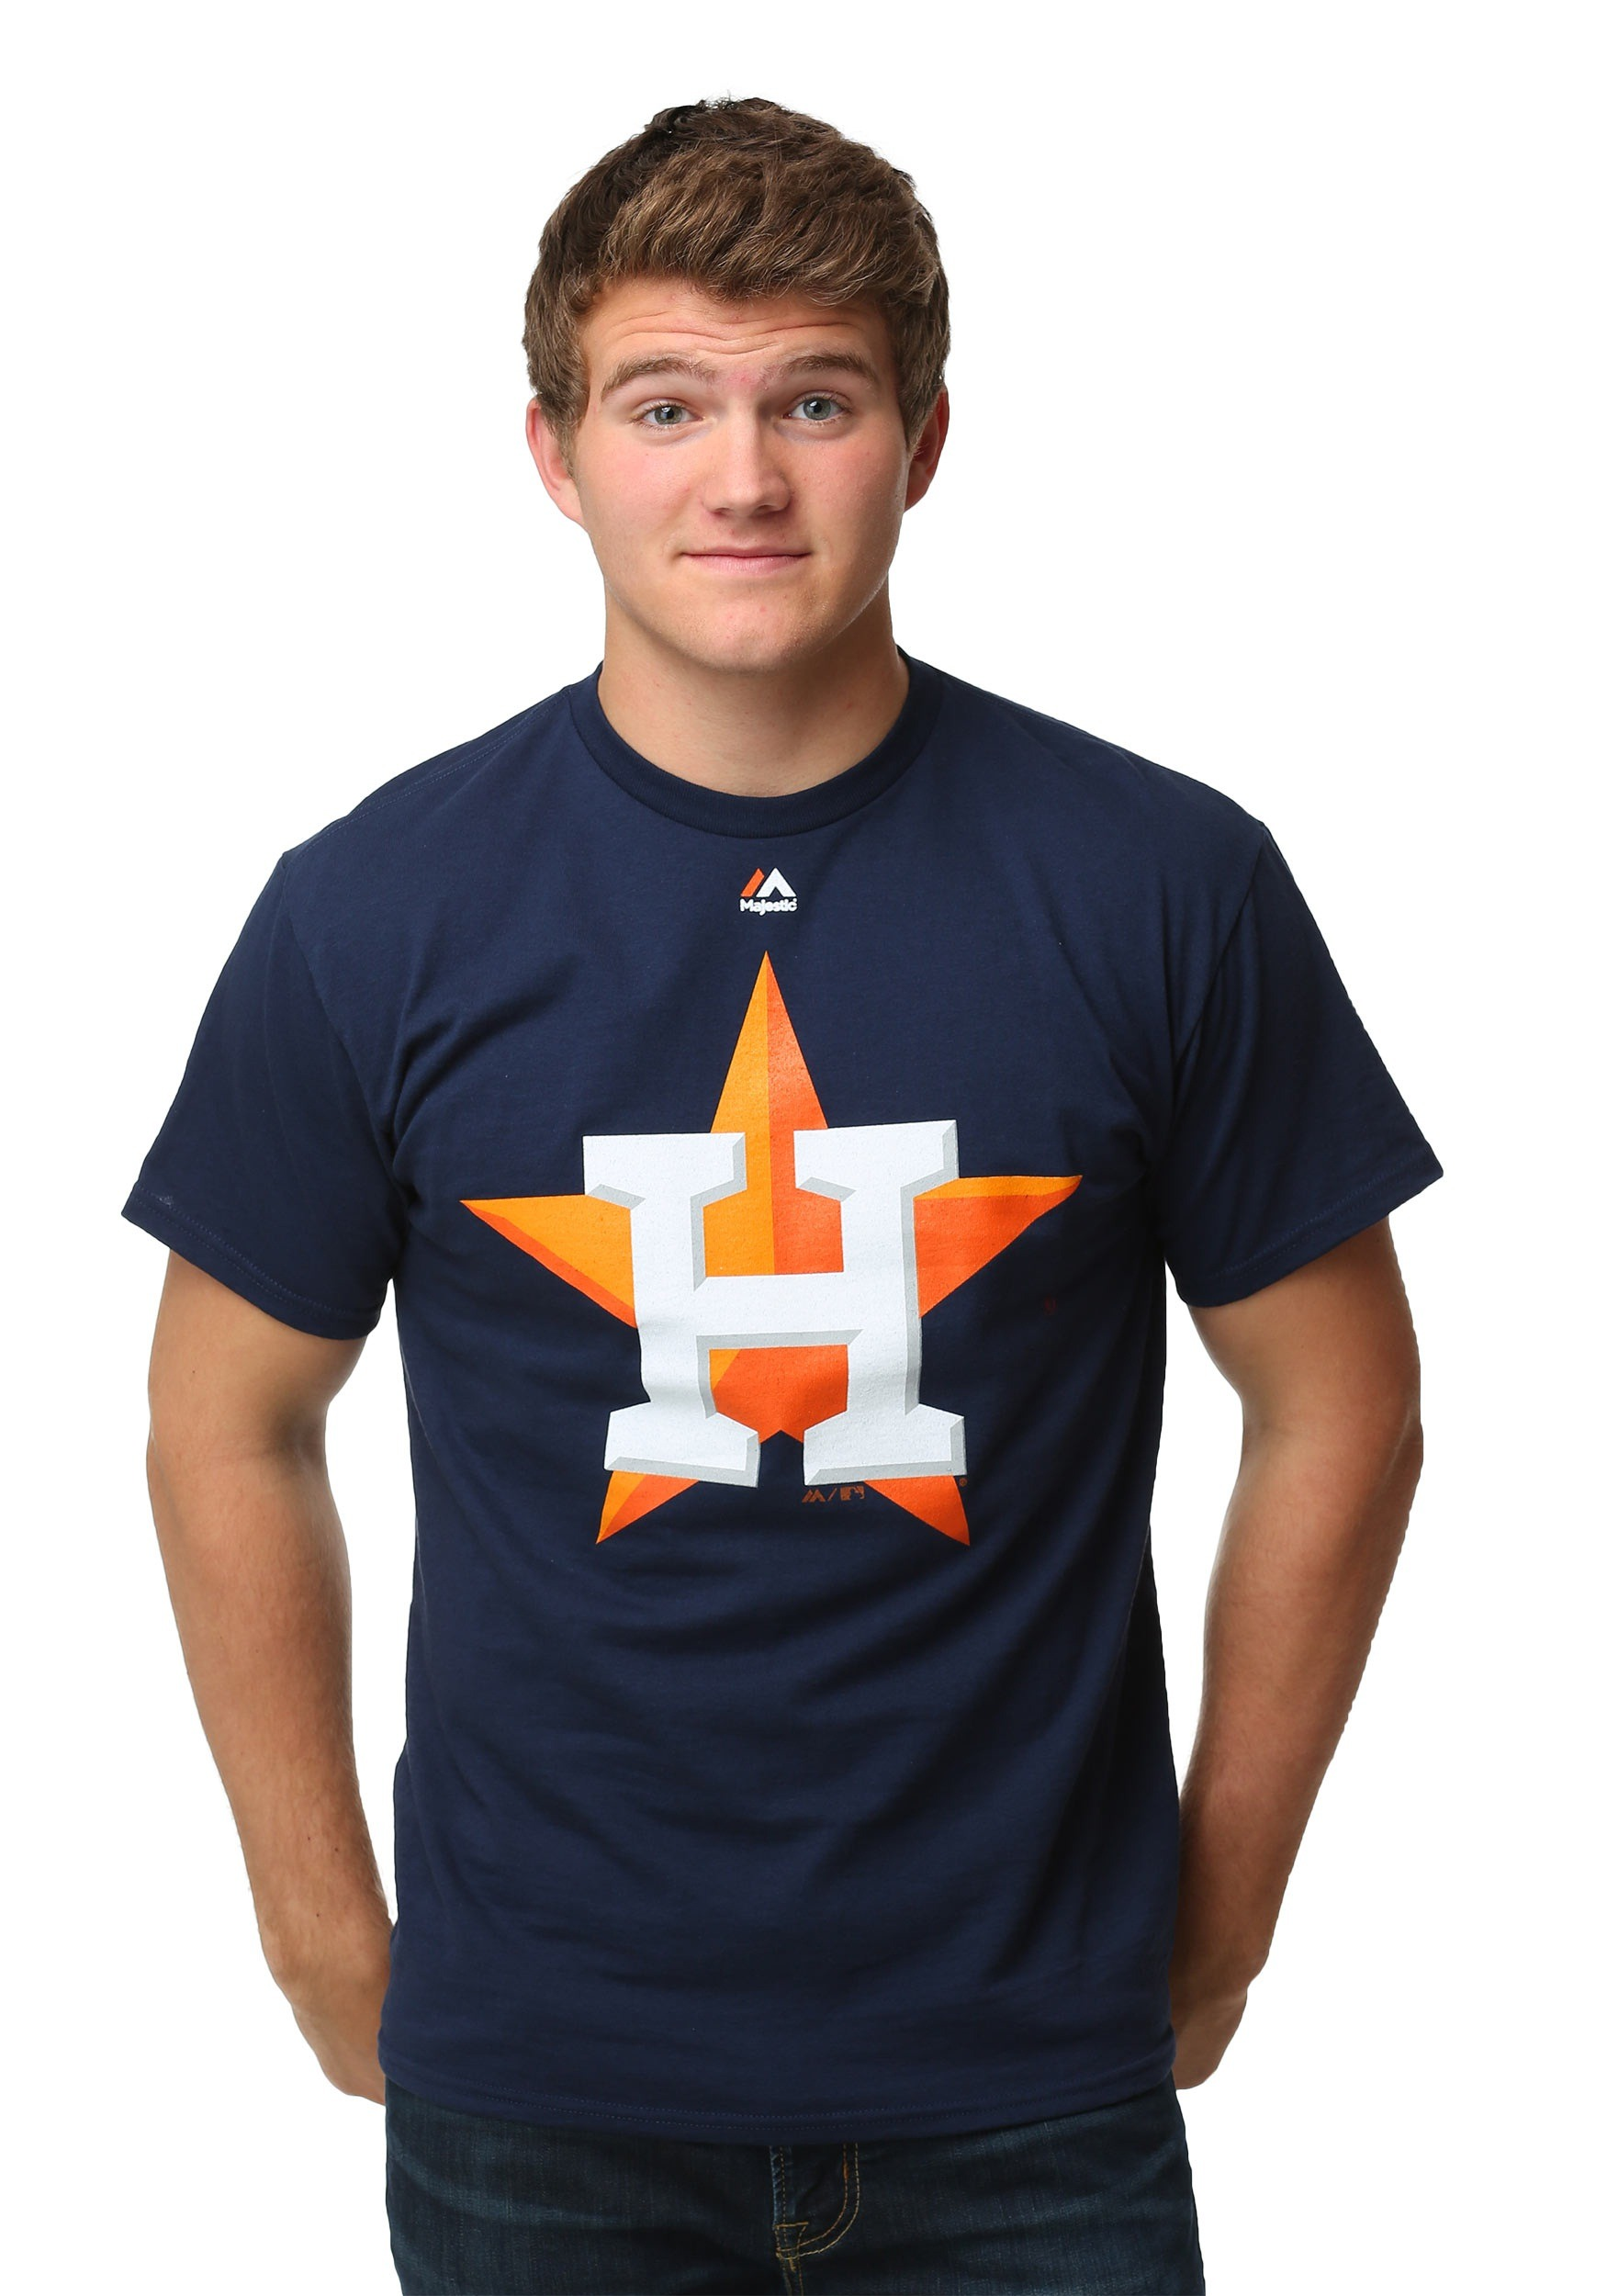 ac02f4c2bb6a5 houston-astros-official-logo-mens-t-shirt.jpg